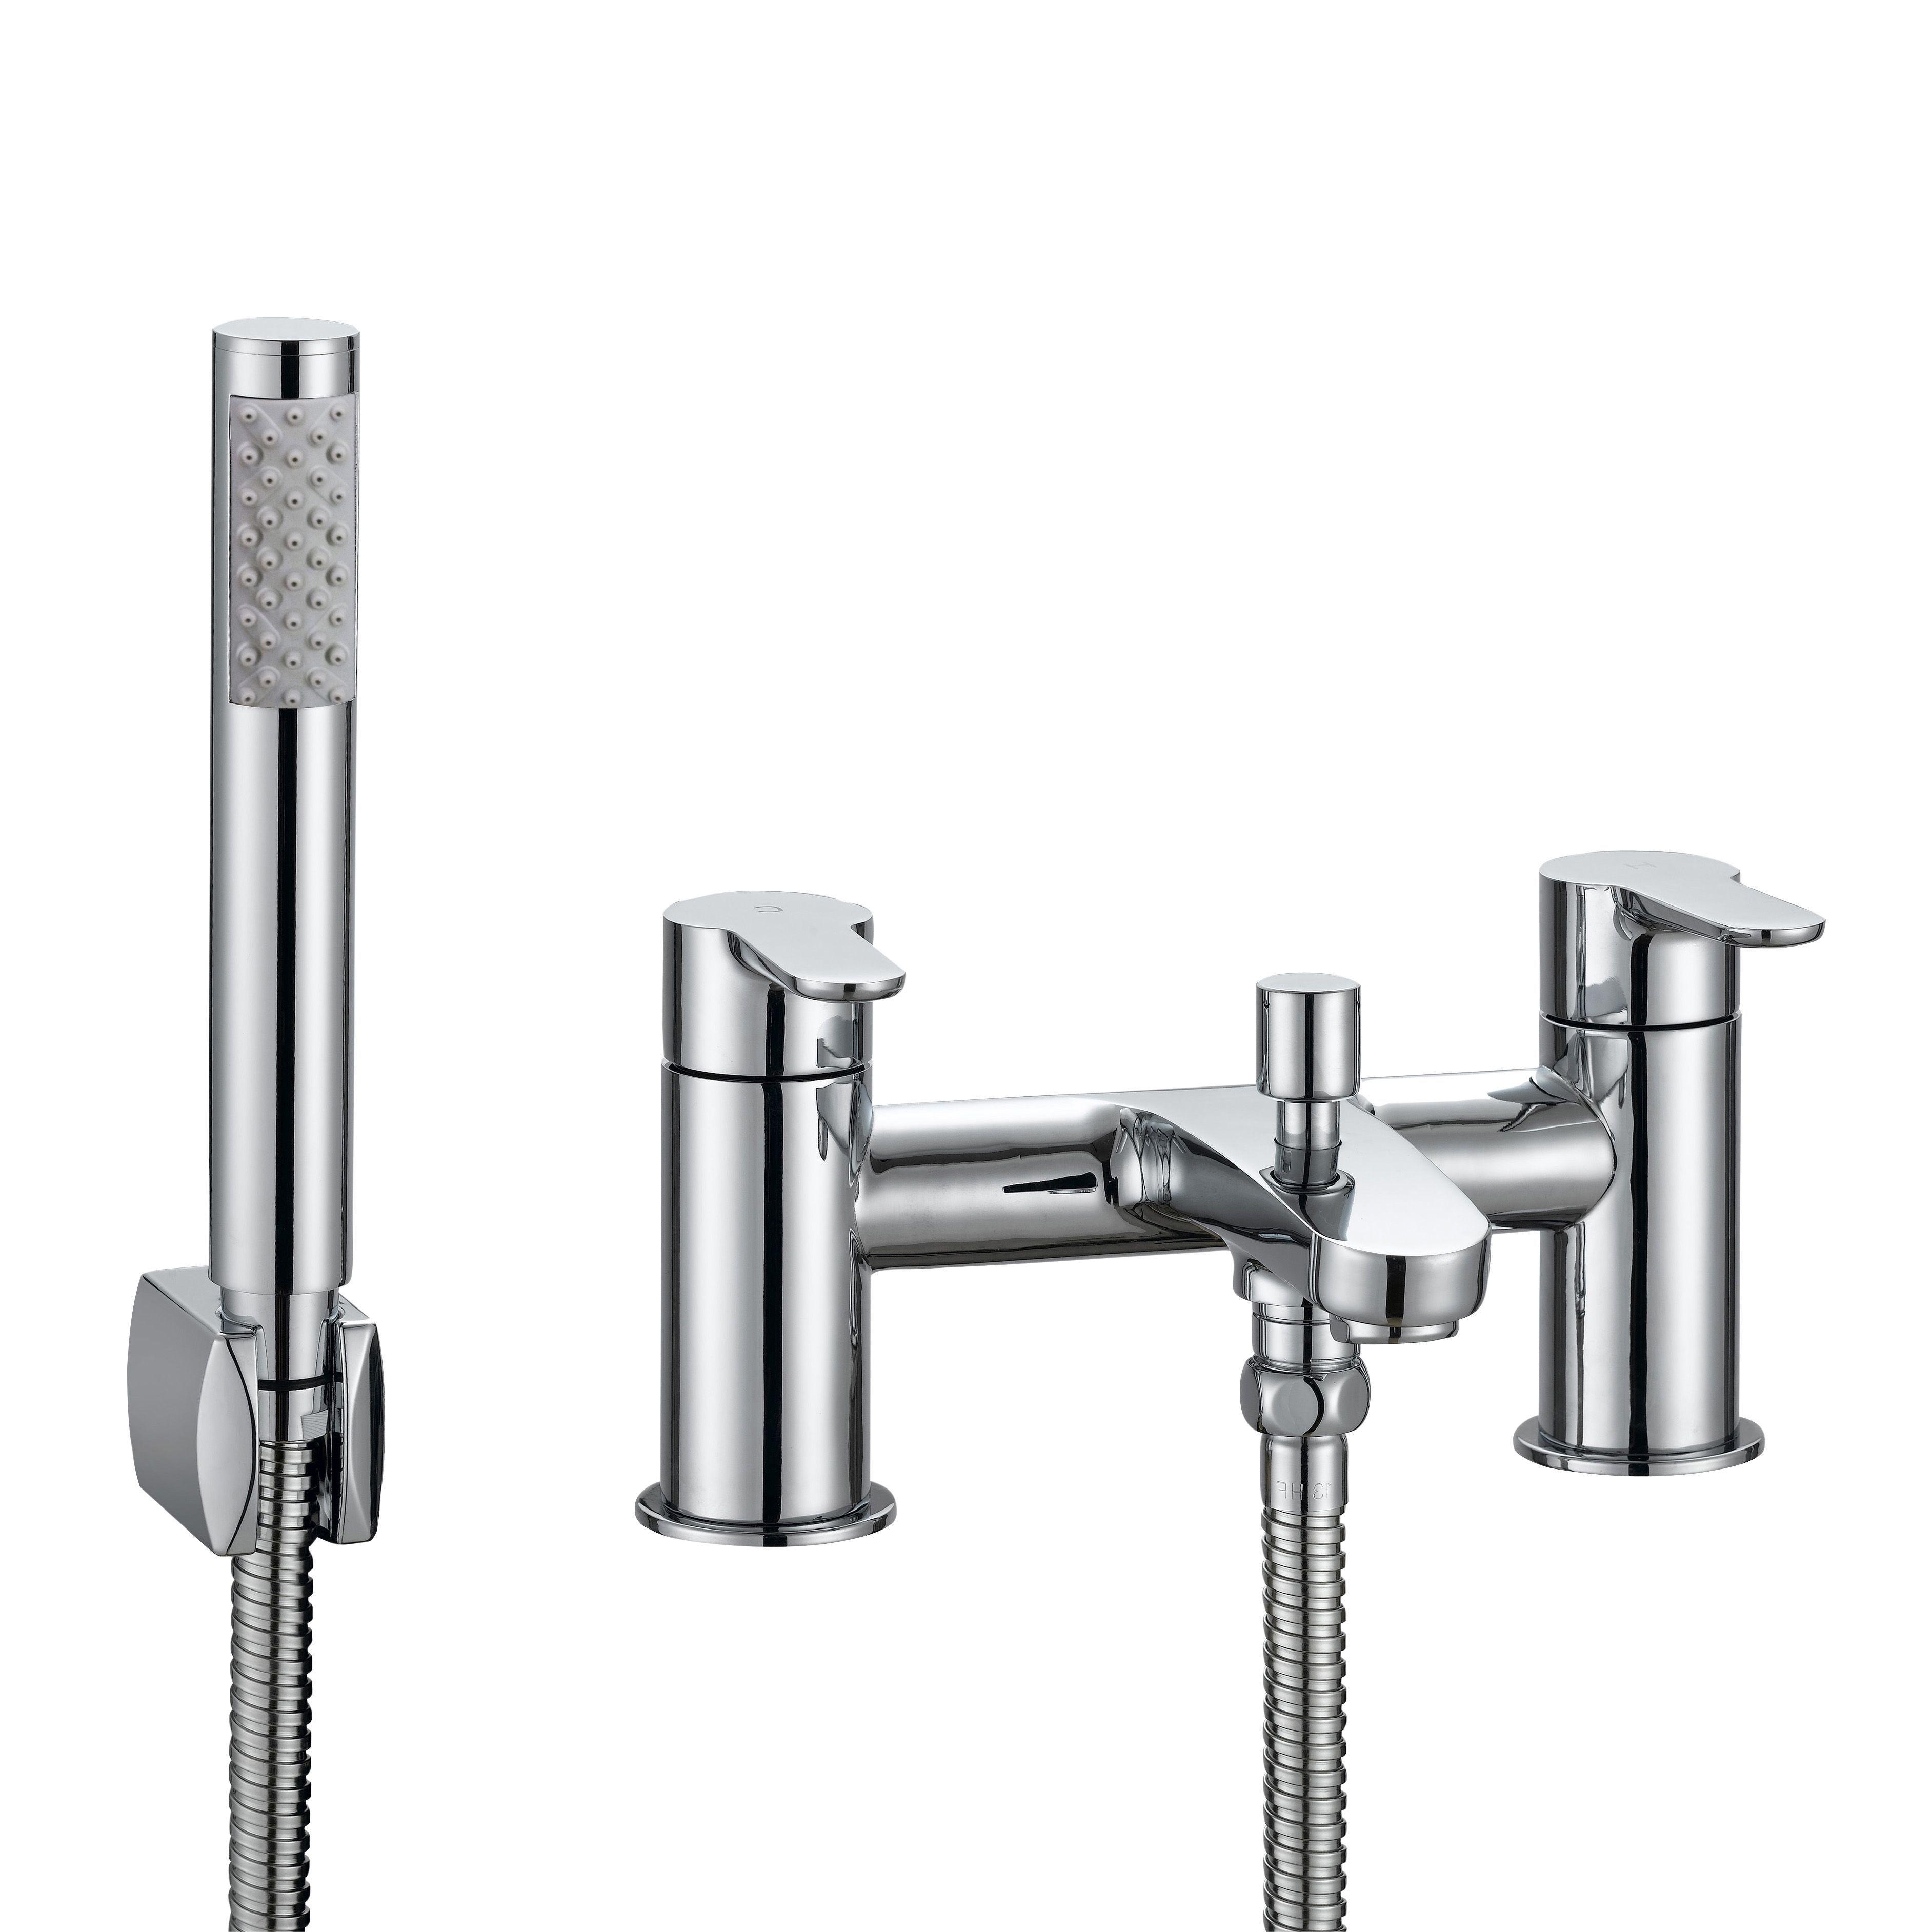 cooke lewis calista chrome bath shower mixer tap. Black Bedroom Furniture Sets. Home Design Ideas